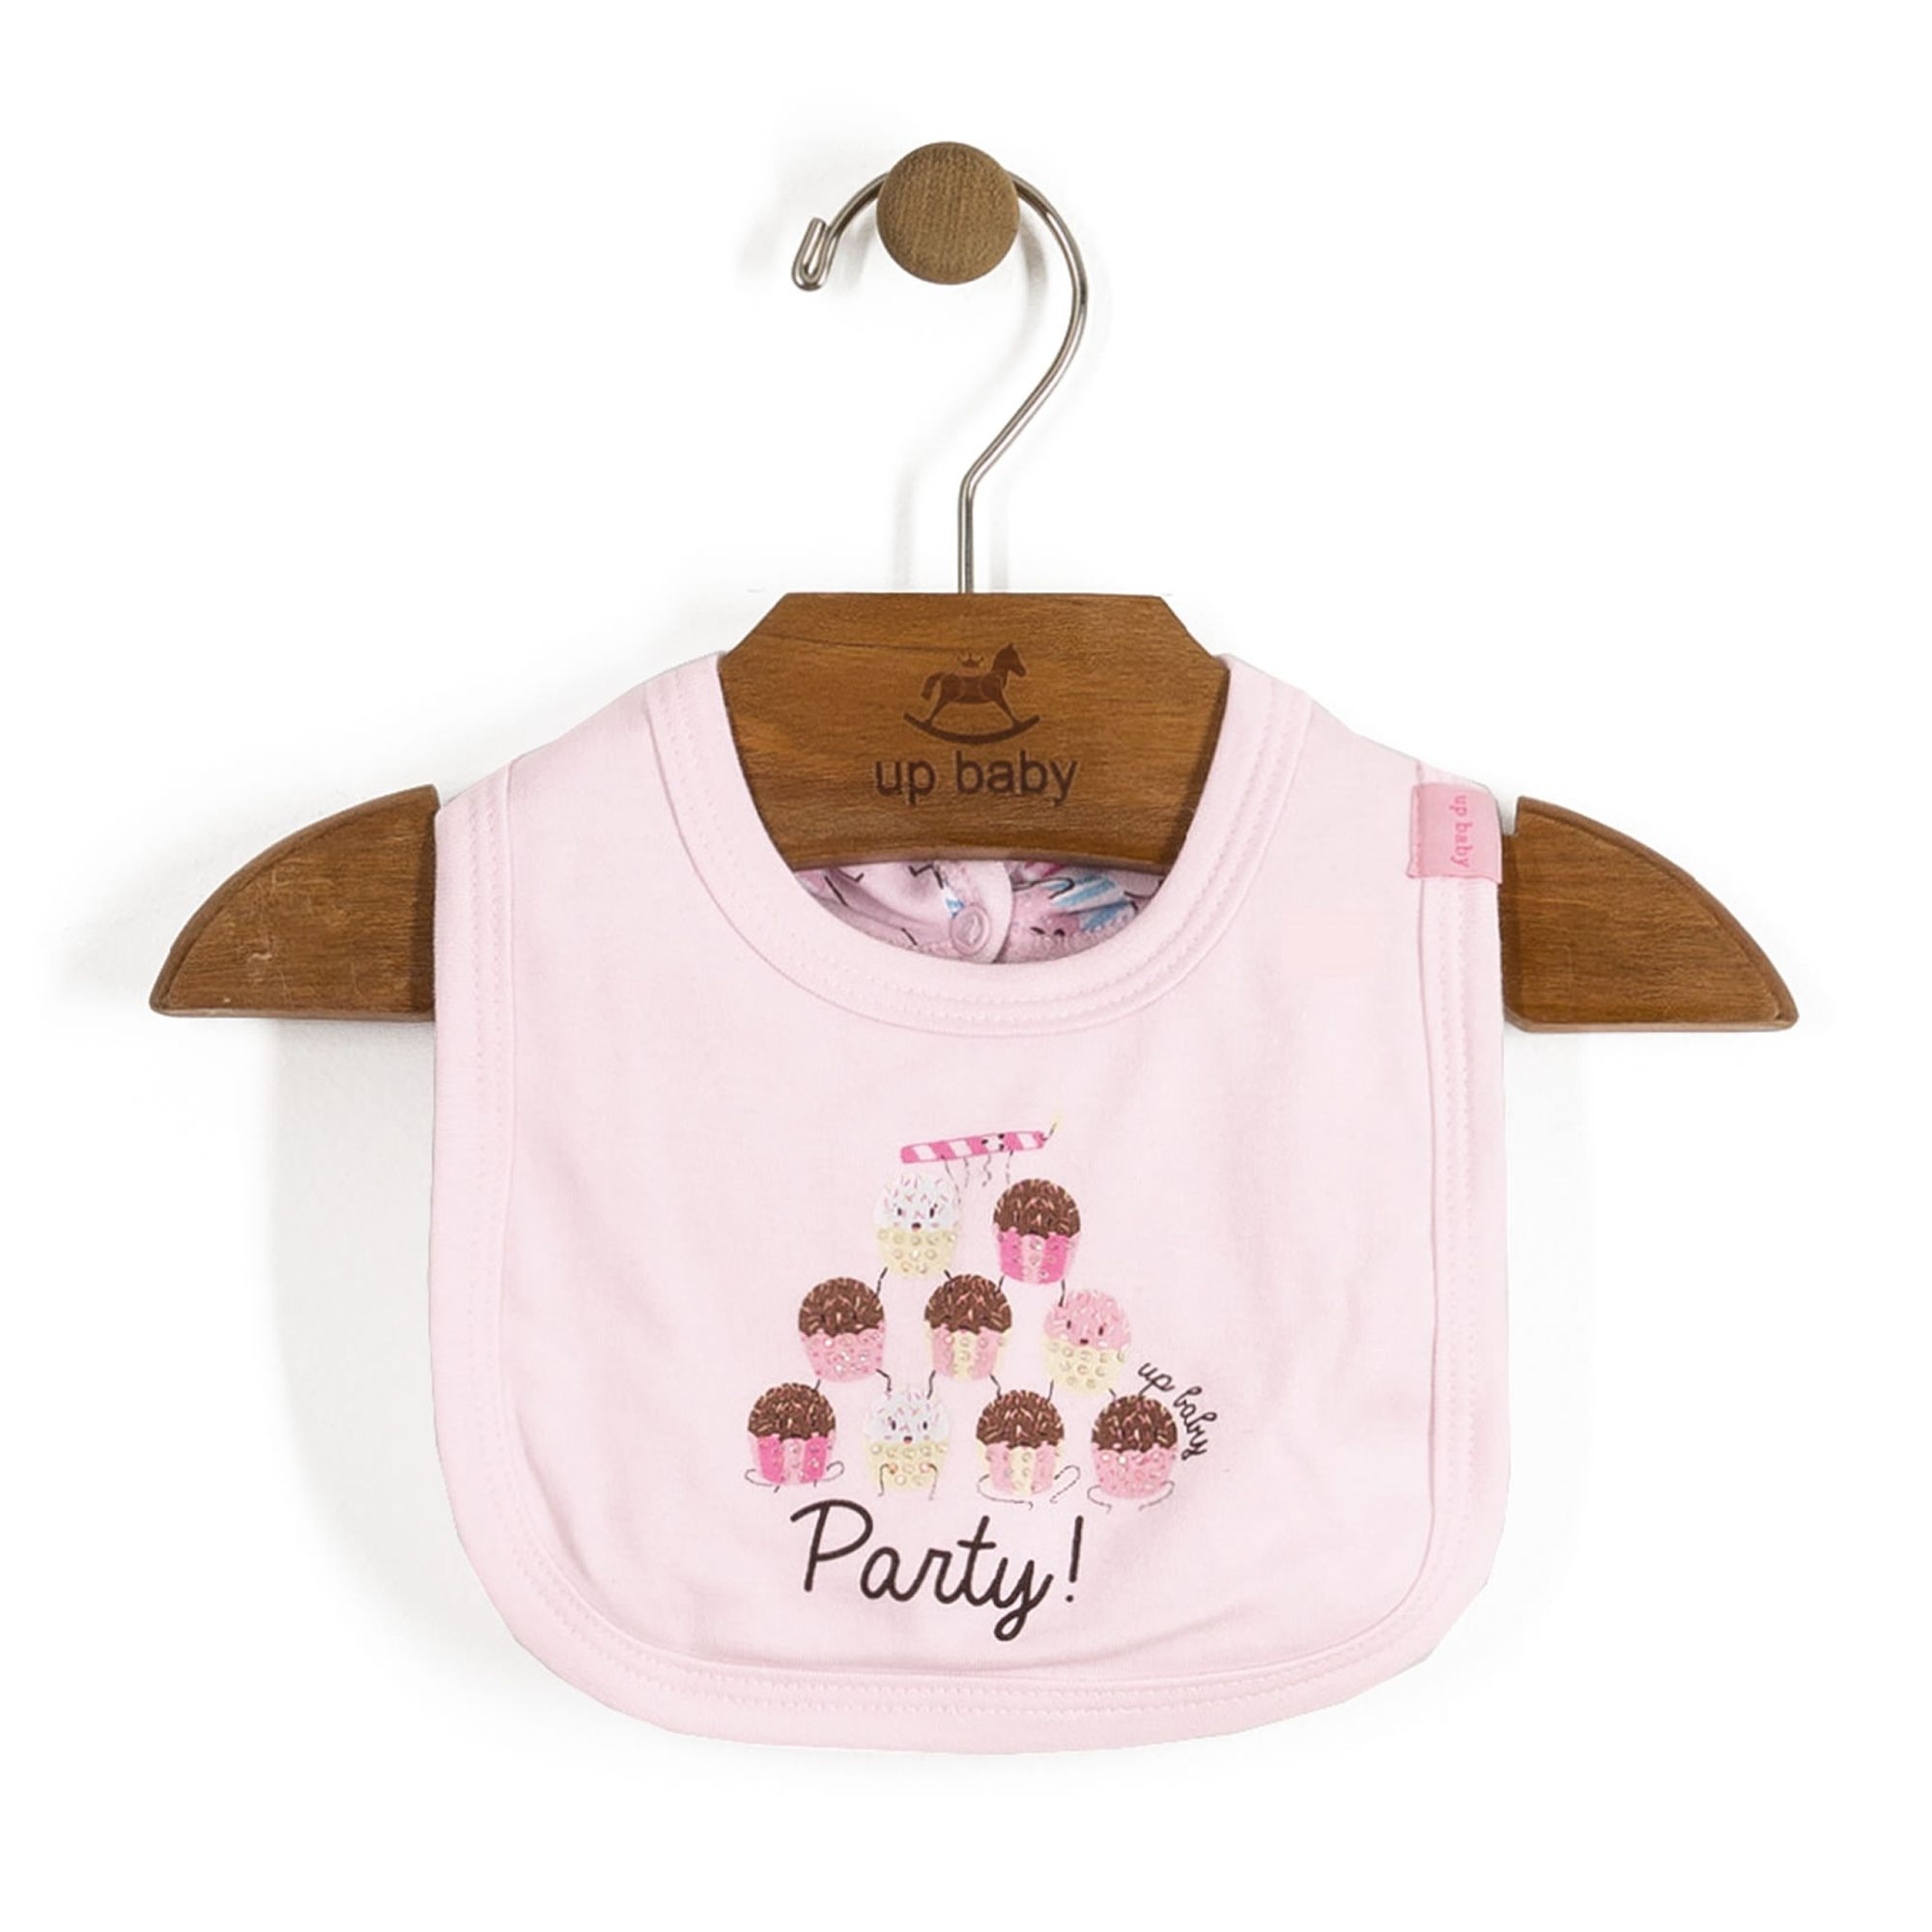 babador-up-baby-dupla-face-suedine-rosa-cupcakes